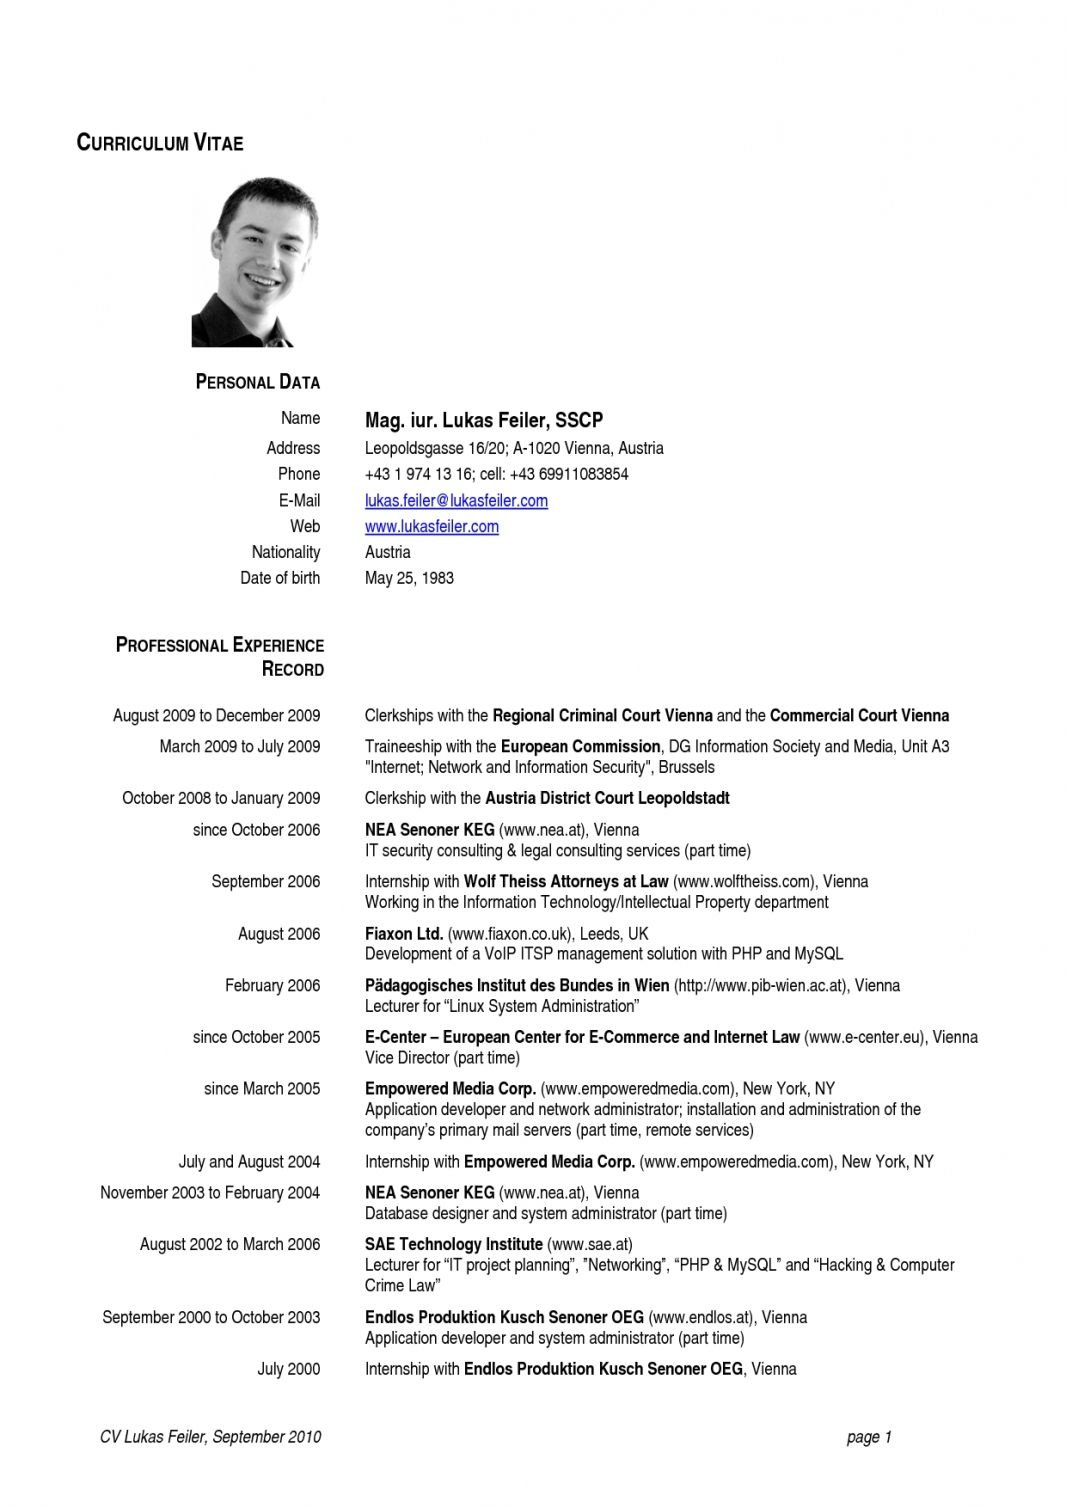 Cv Template Europe Resume Format Curriculum Vitae Curriculum Vitae Format Curriculum Vitae Template